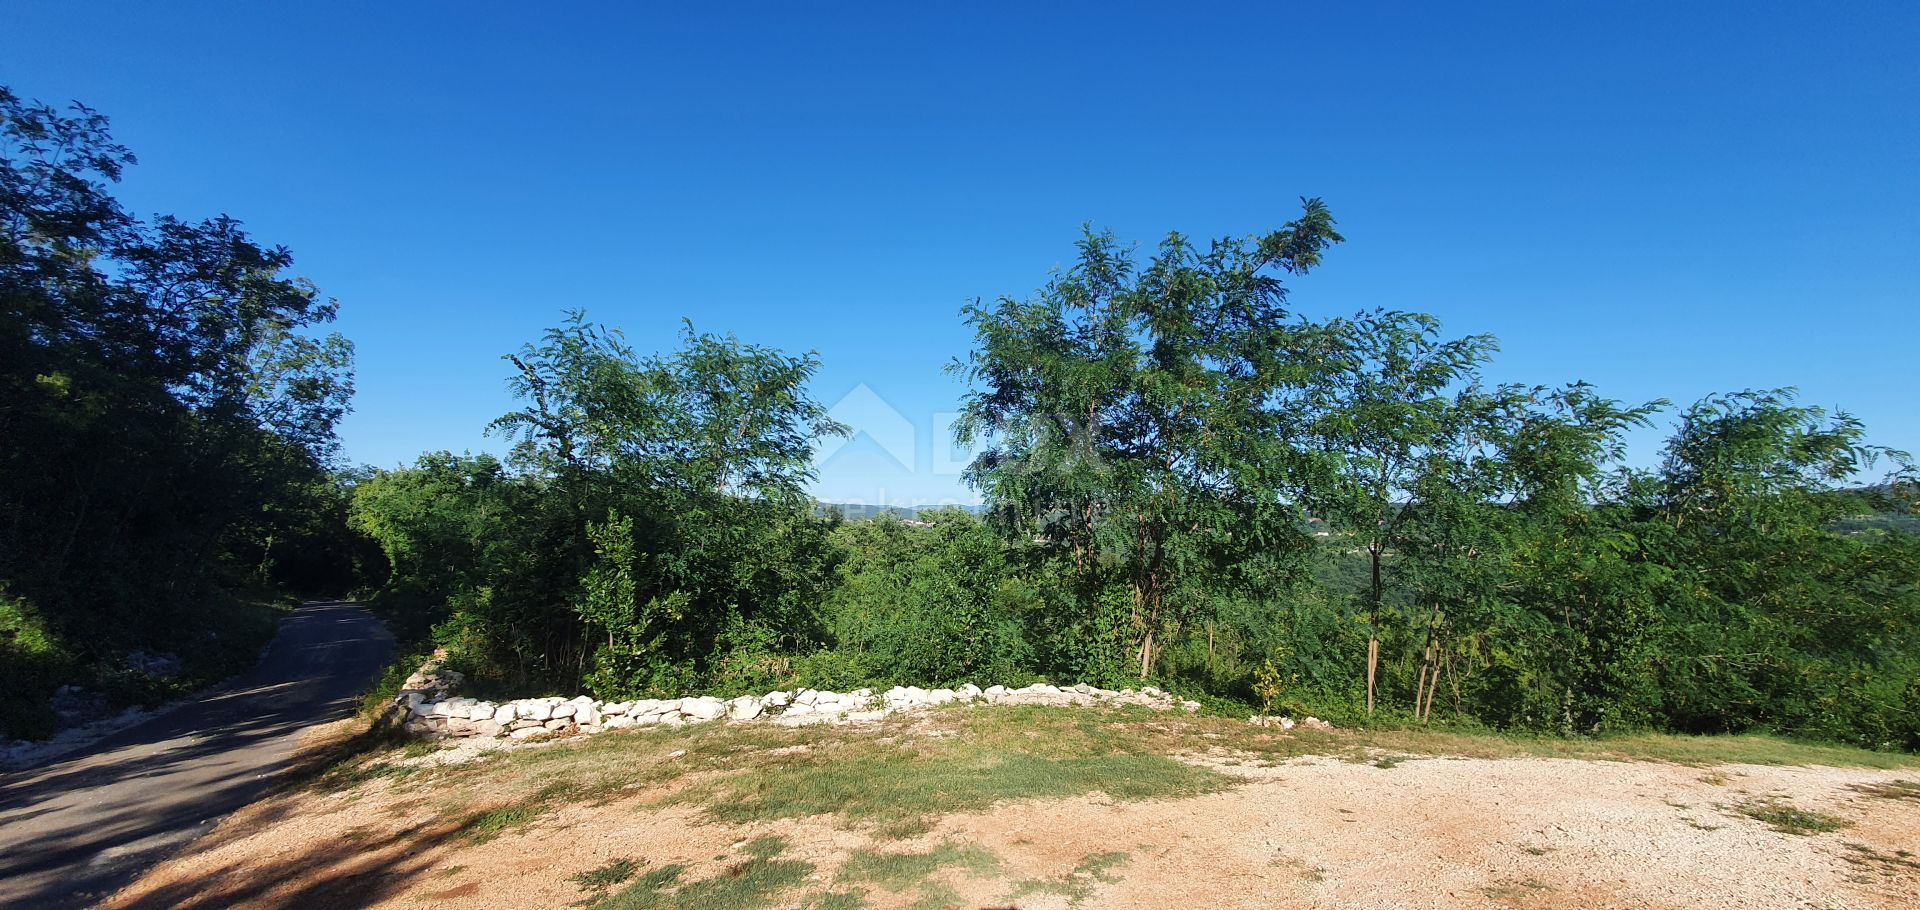 ISTRA, LABIN - Građevinsko, otvoreni pogled